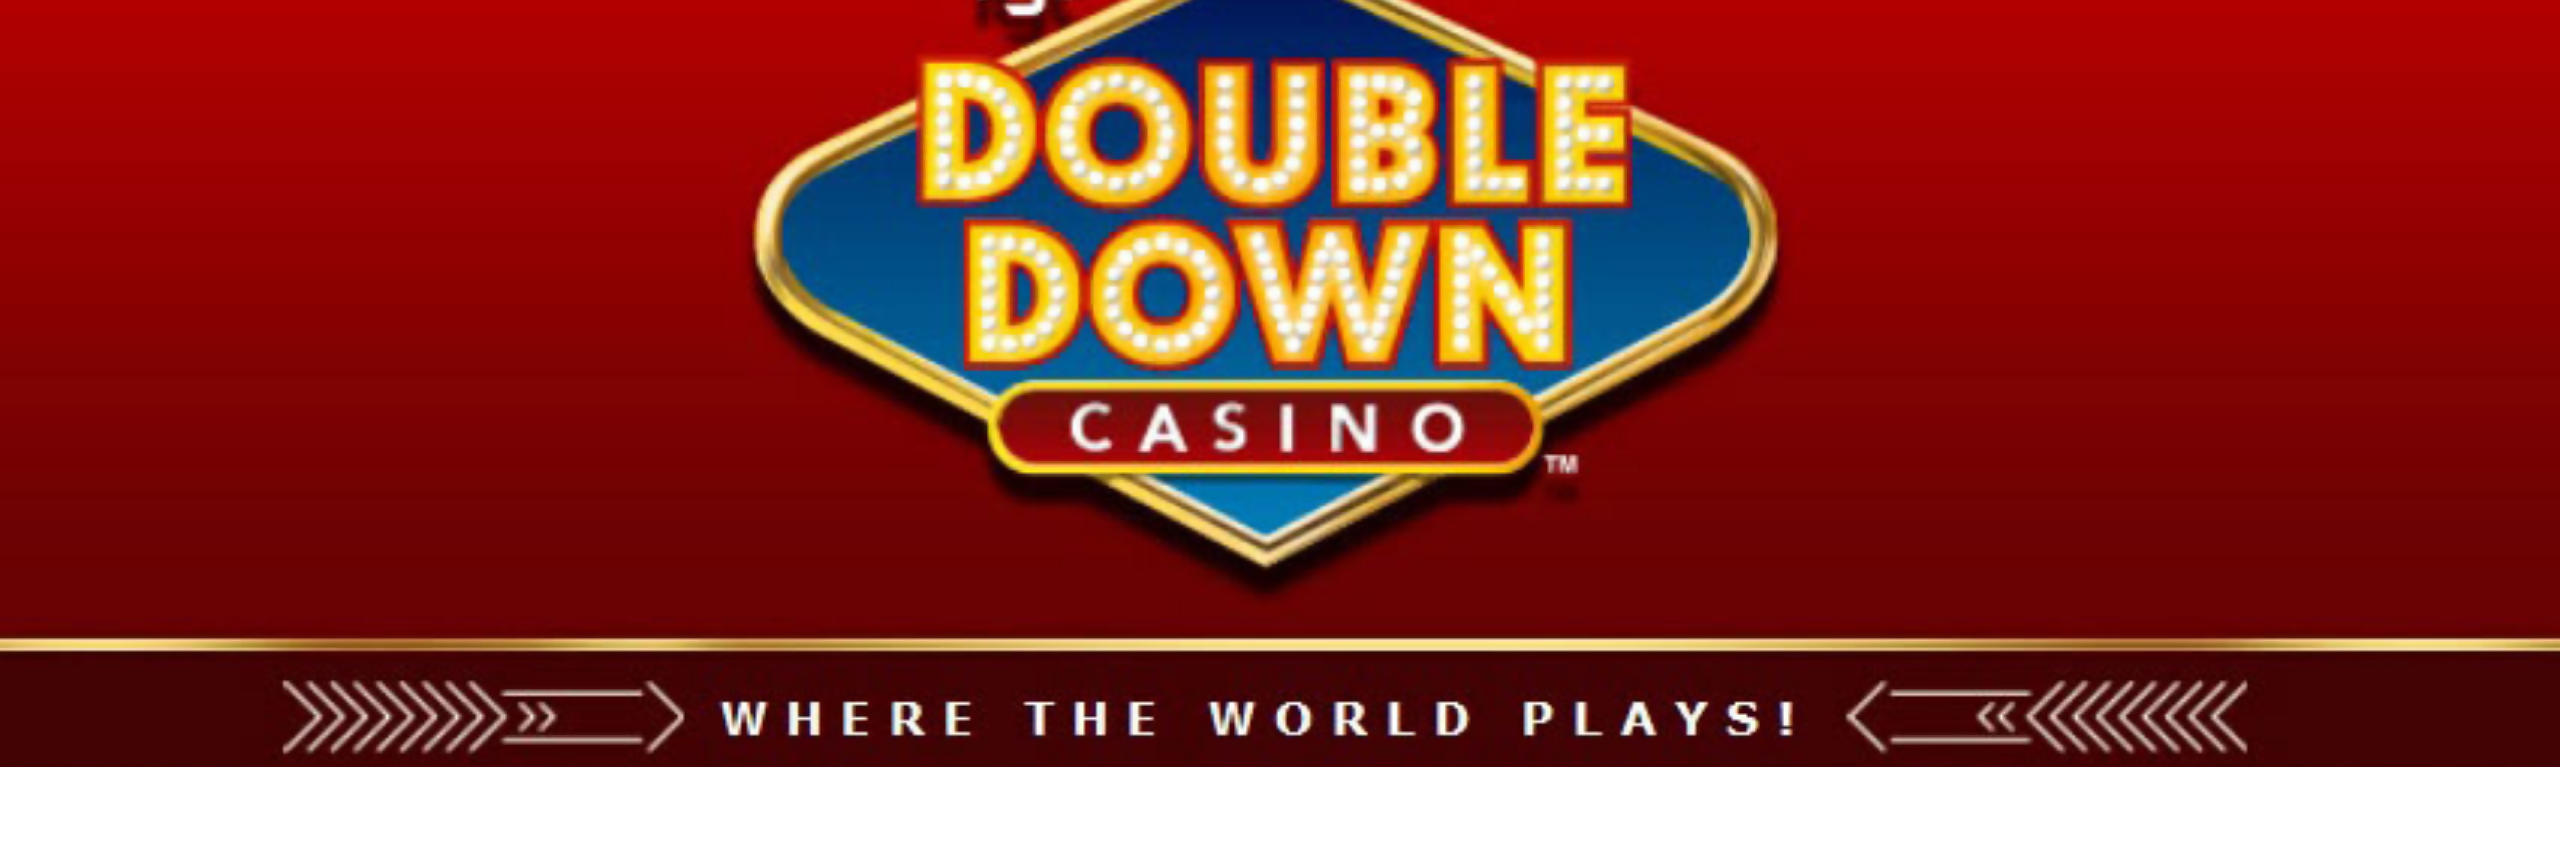 DoubleDown Casino Free Chips , Slots & Codes Gener